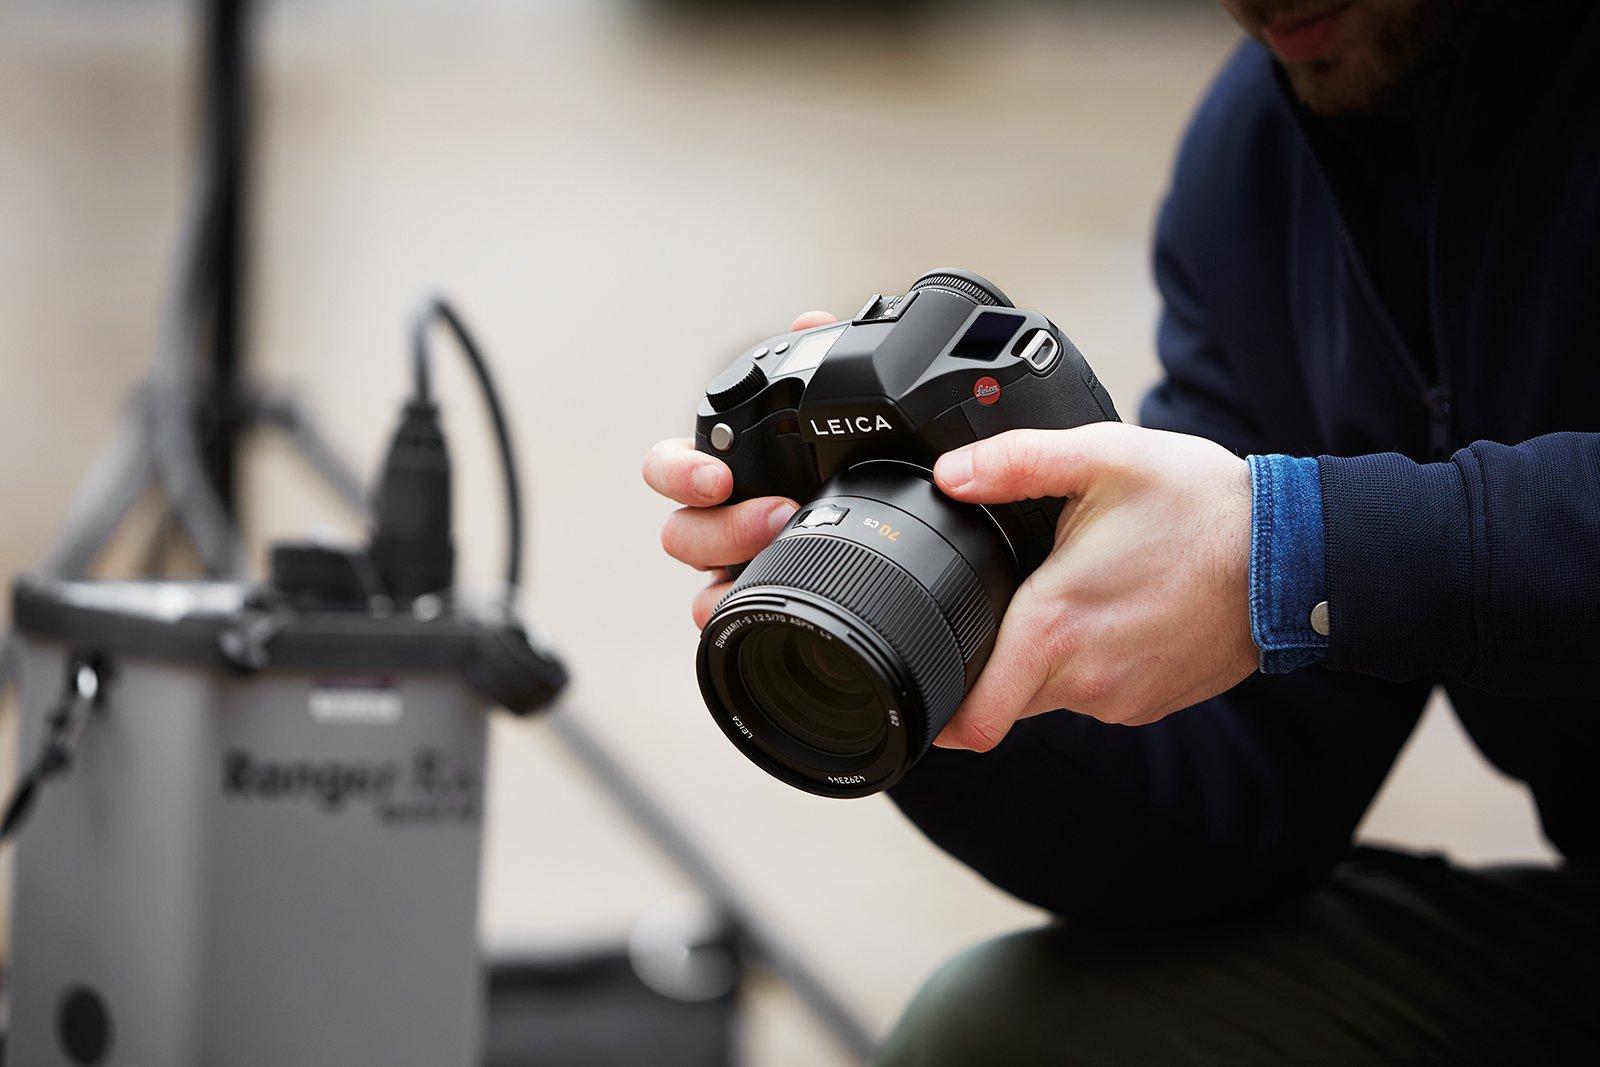 Leica introduces 64-megapixel S3 camera